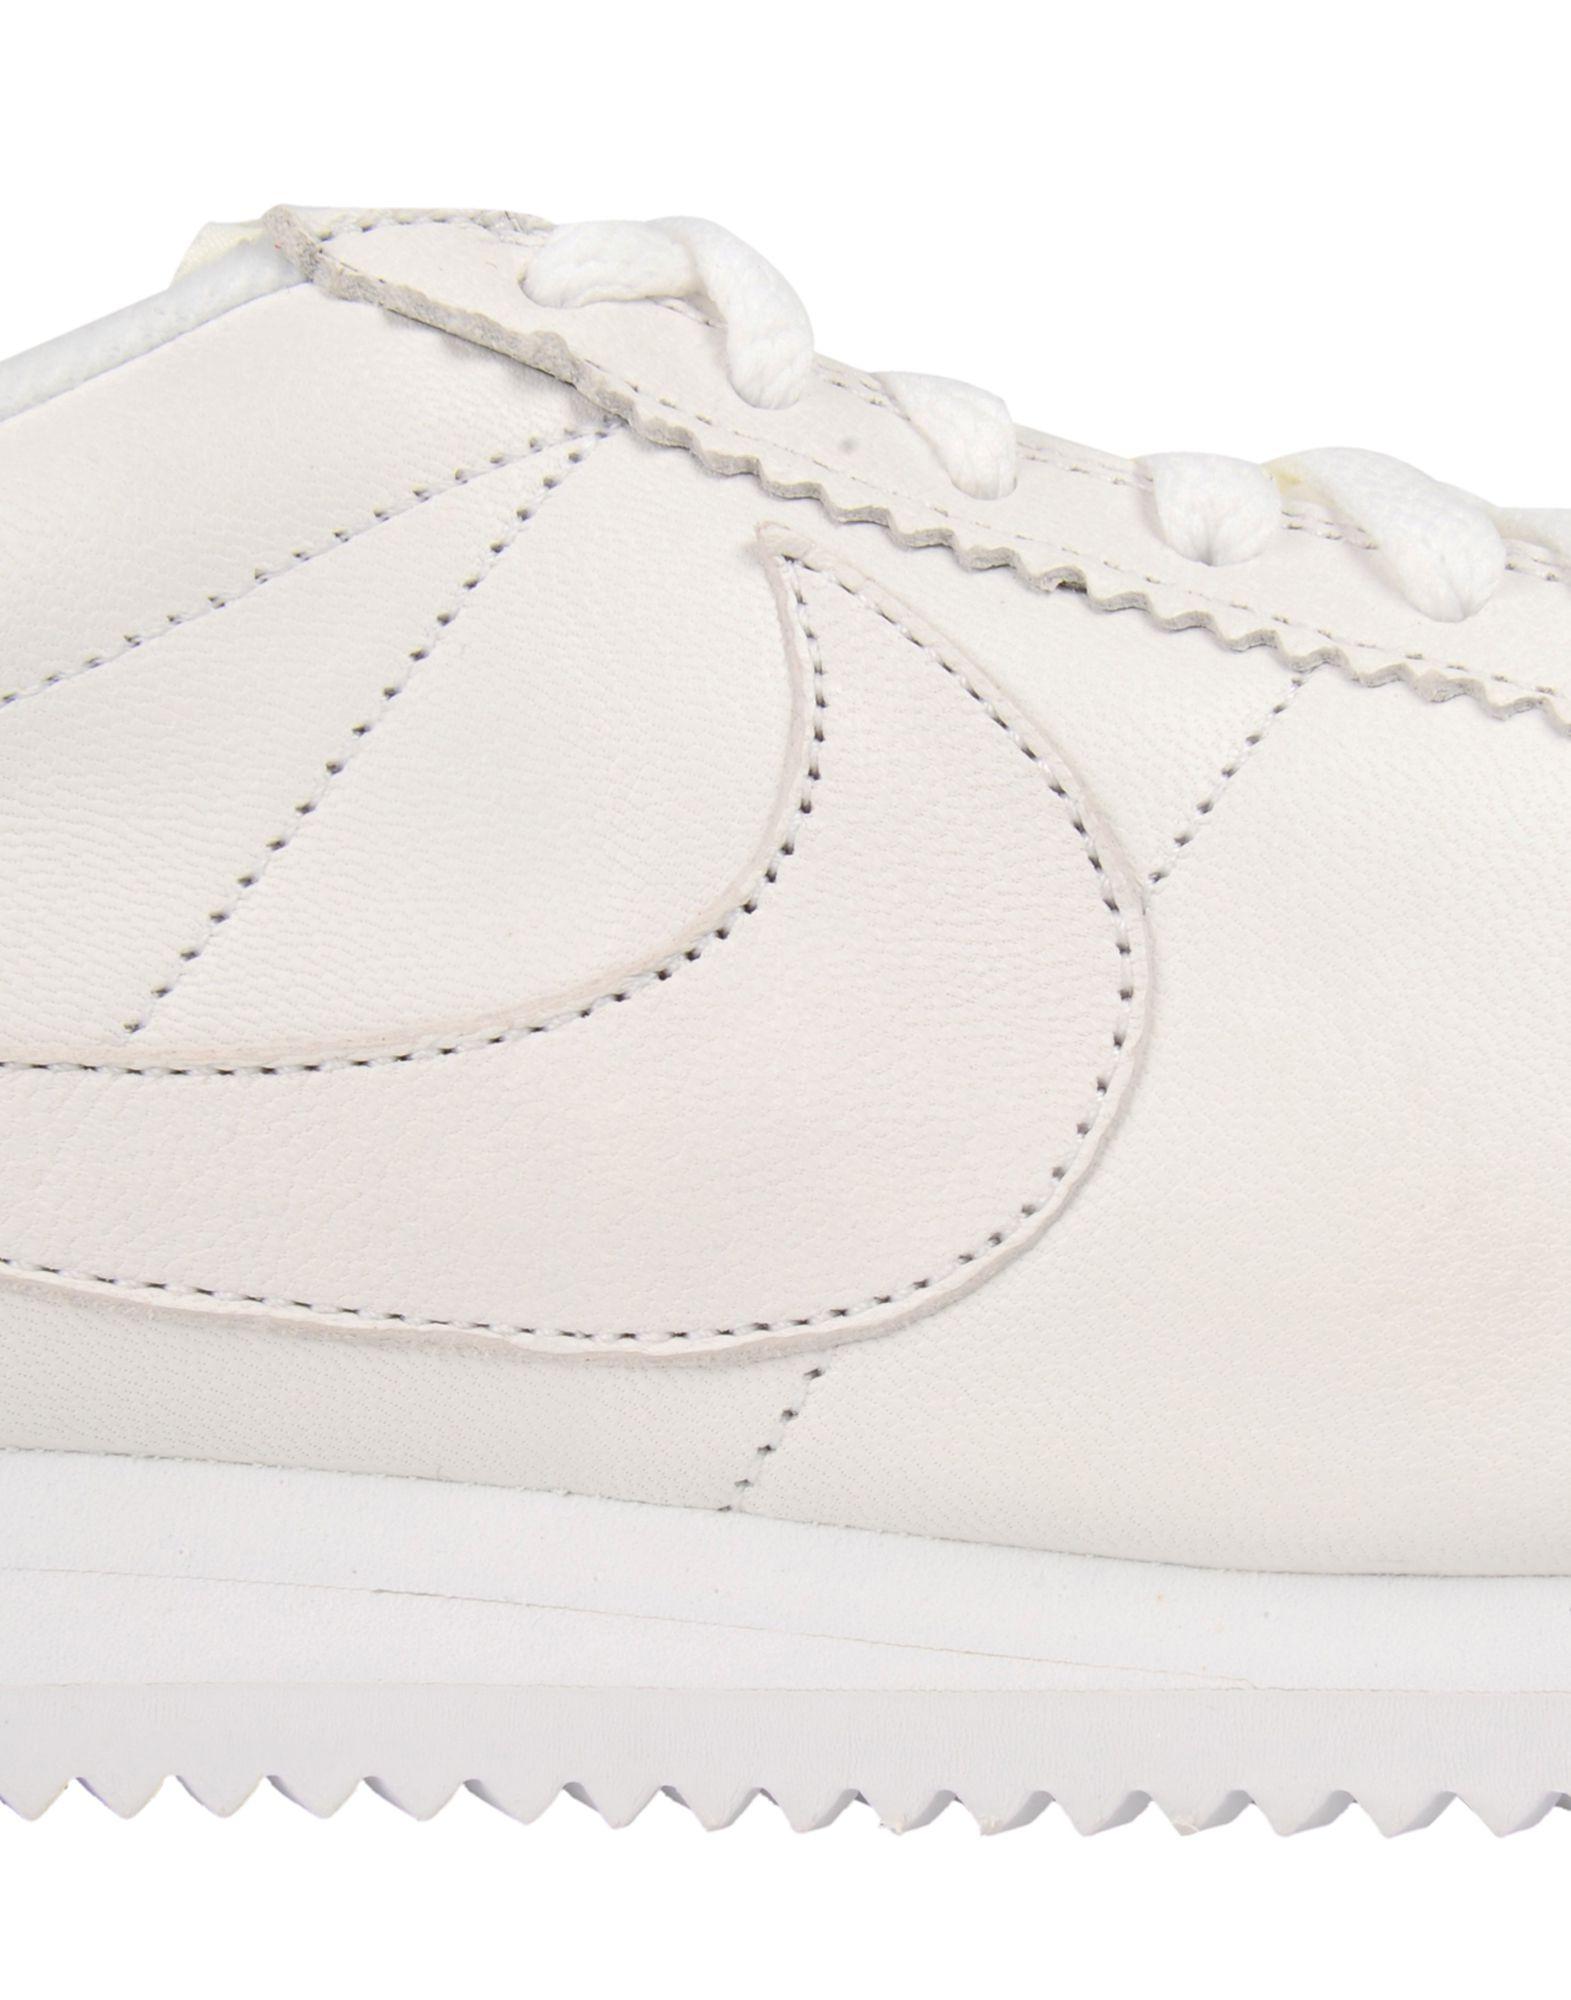 Sneakers Nike Classic Cortez Leather Prem - Femme - Sneakers Nike sur